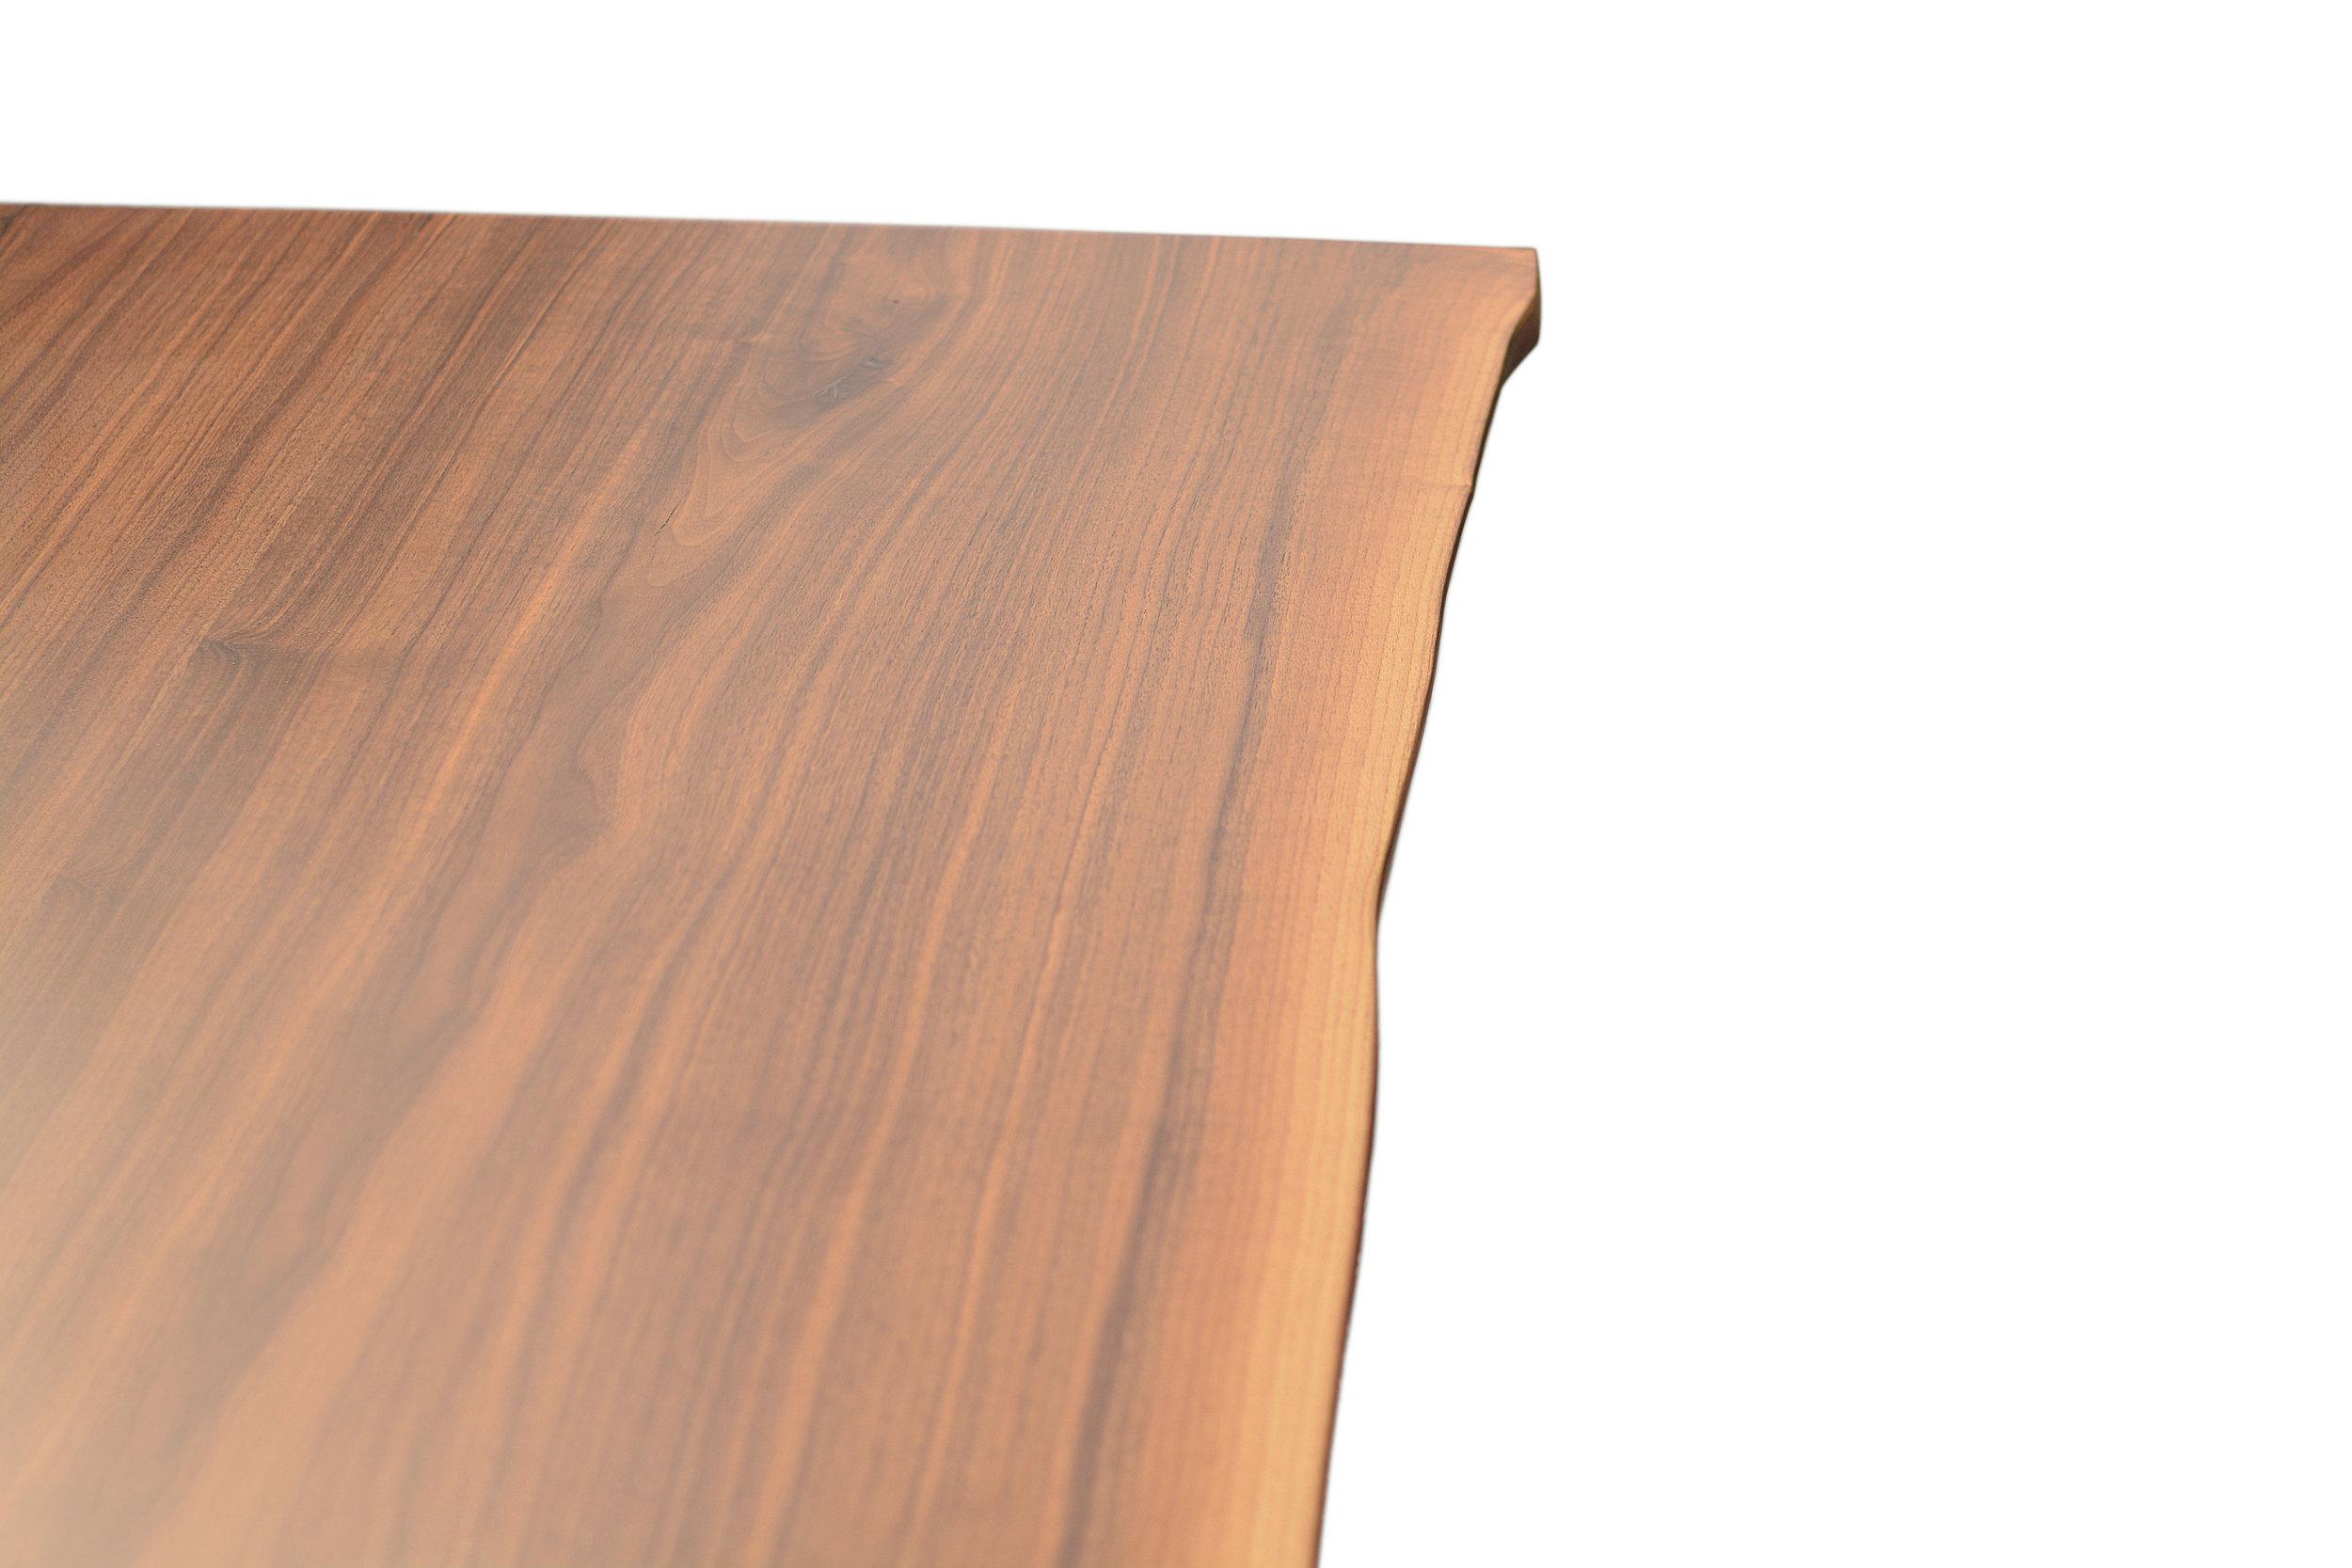 Etz & Steel Hermes Live Edge Walnut Table Close Up 18.JPG